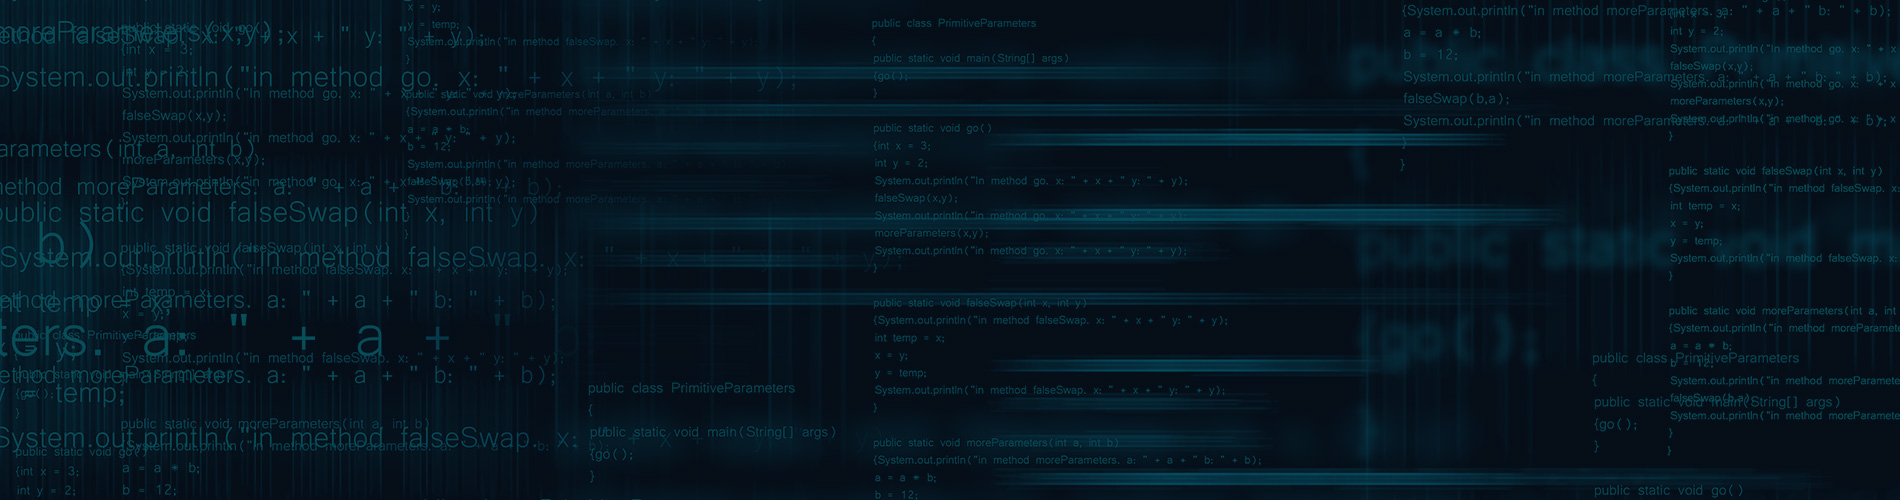 1447765577 capas introducao a programacao orientada a objeto